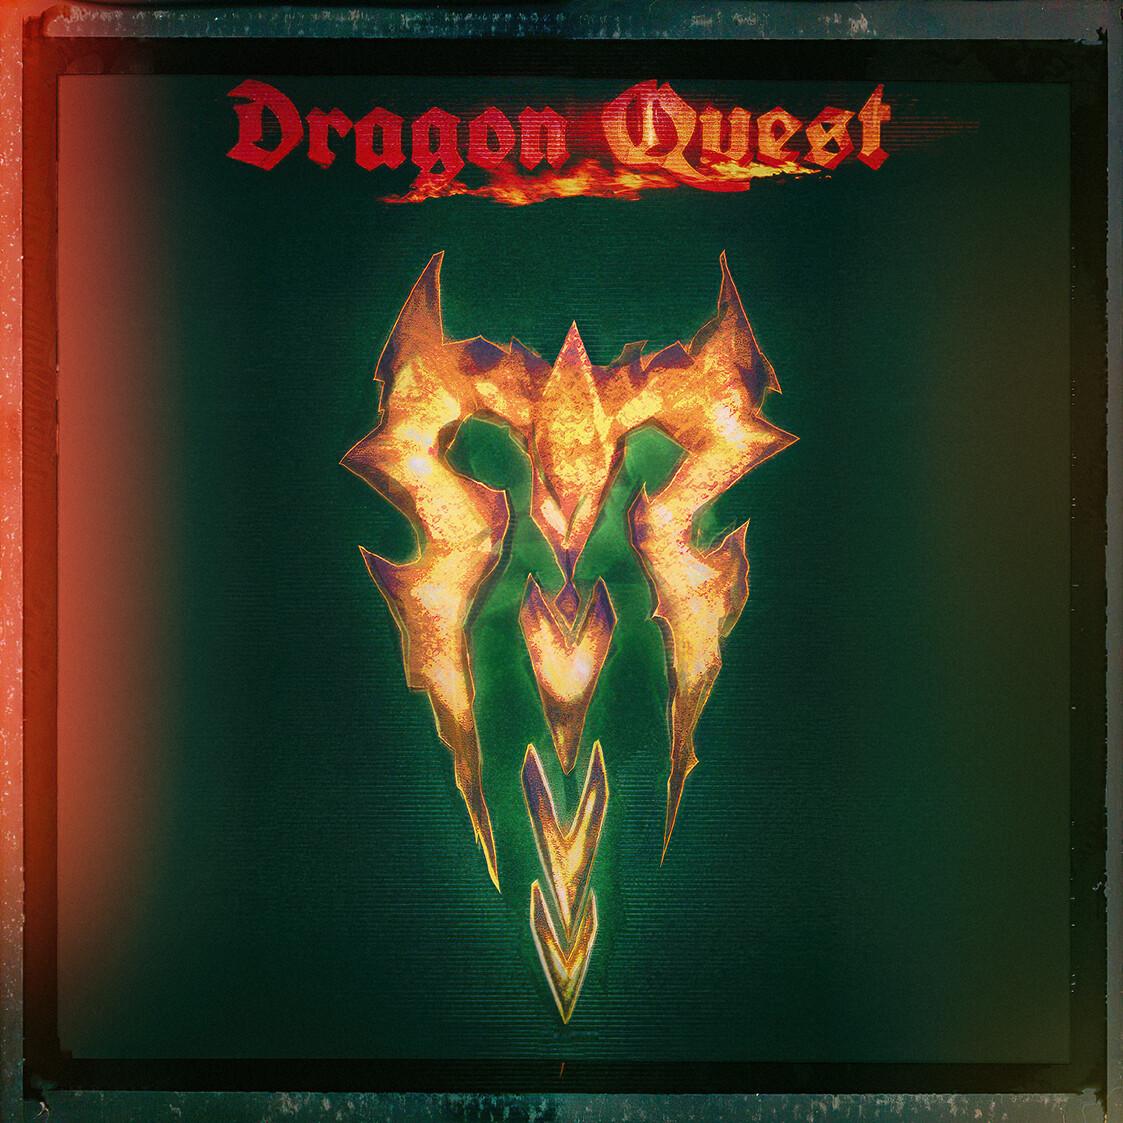 🏁 DRAGON QUEST 🏁